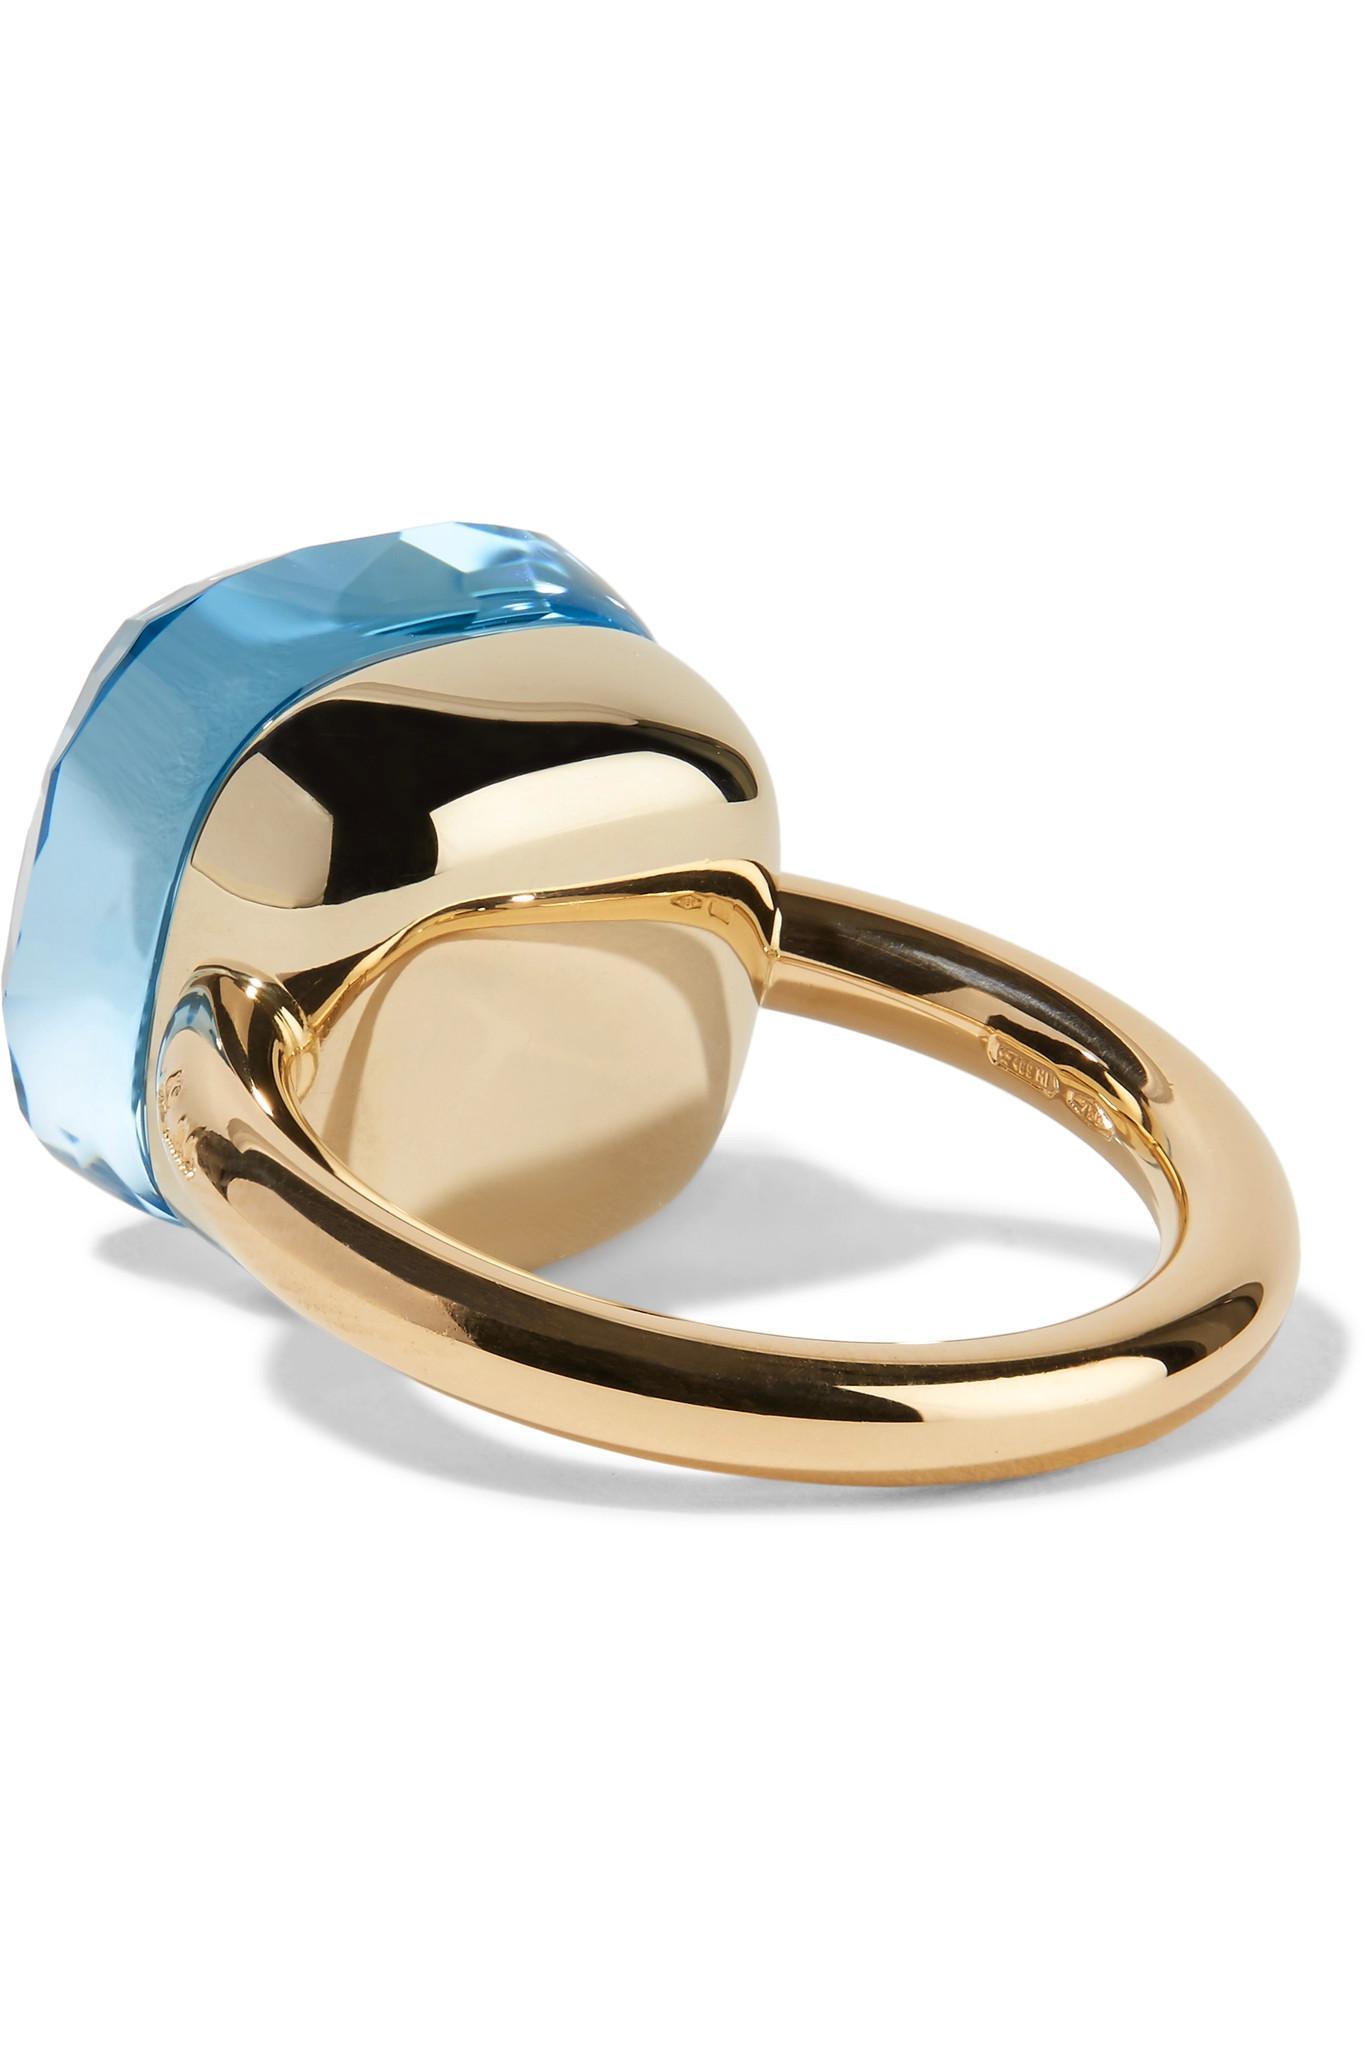 Pomellato Blue Topaz Diamond Nudo Ring | Betteridge